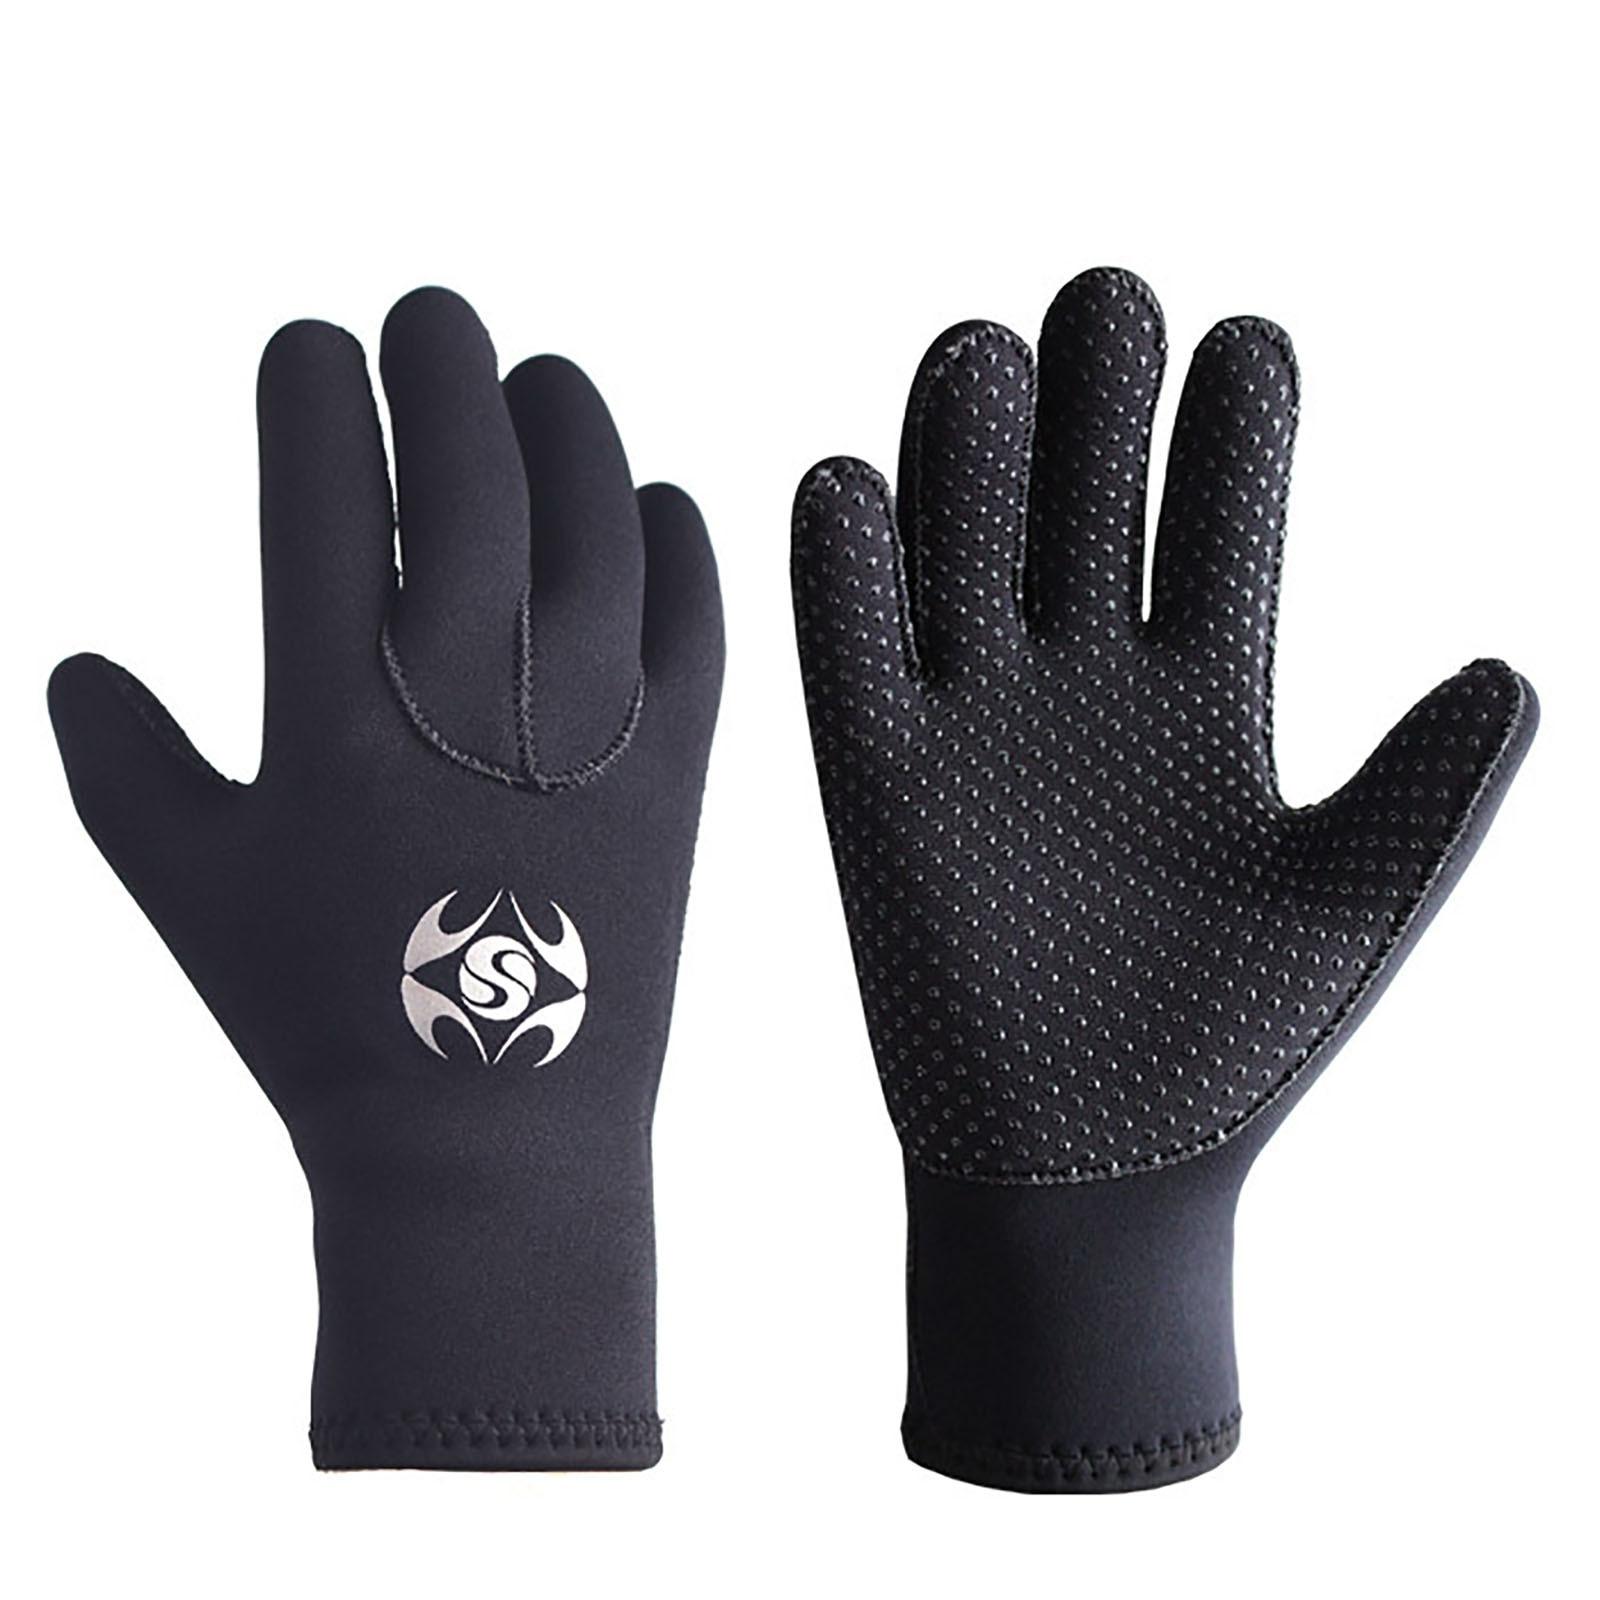 3 мм неопрена дайвинг перчатки Для мужчин перчатки Гидрокостюма для подводного плавания на каноэ перчатки Для женщин Для мужчин подводной о...